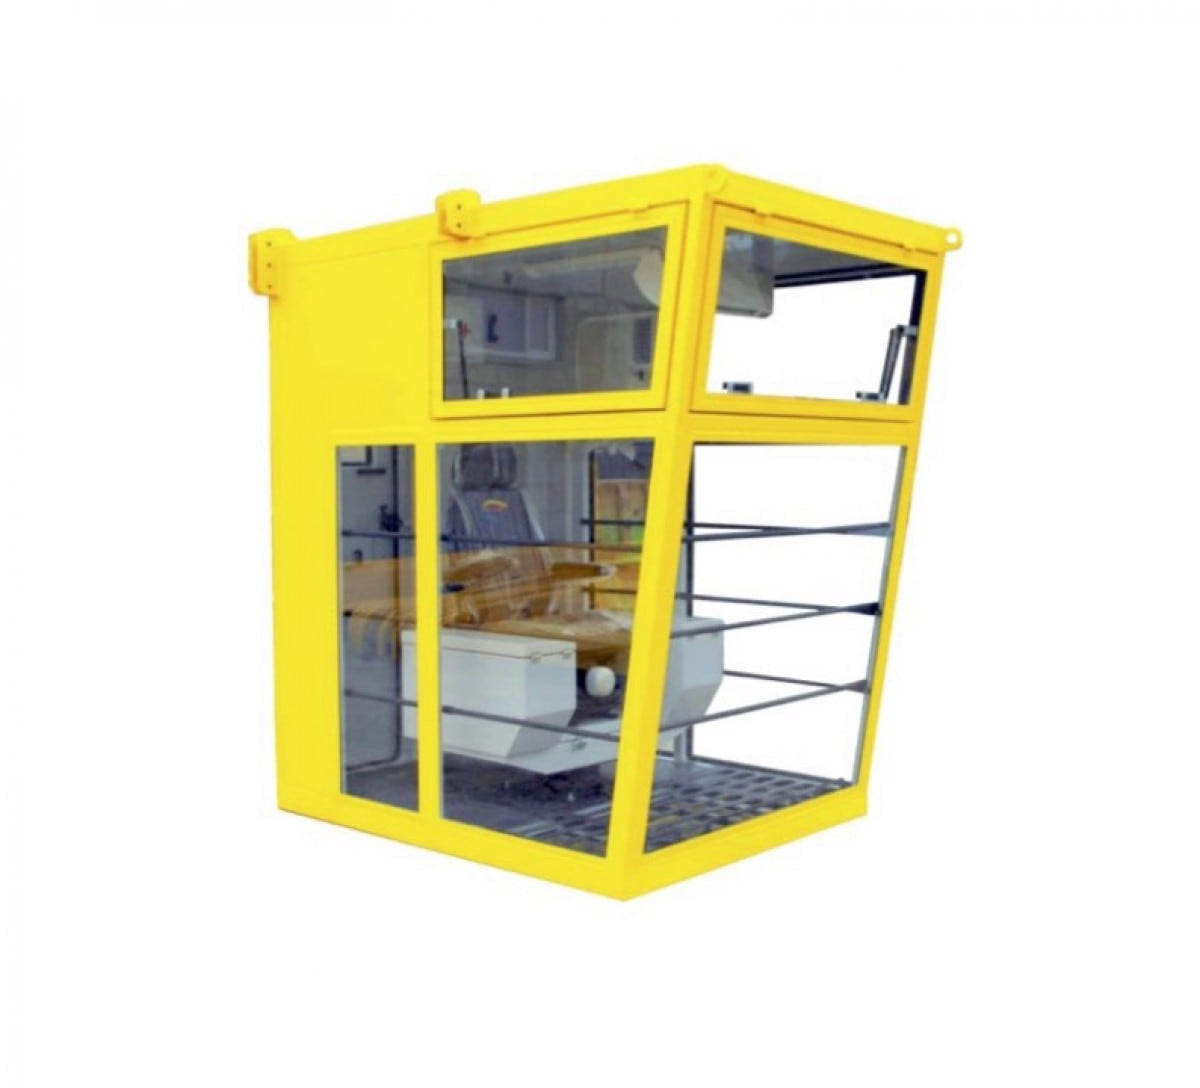 Petrokab cabine, model S: 2,1 × 1,5 × 2,2 m